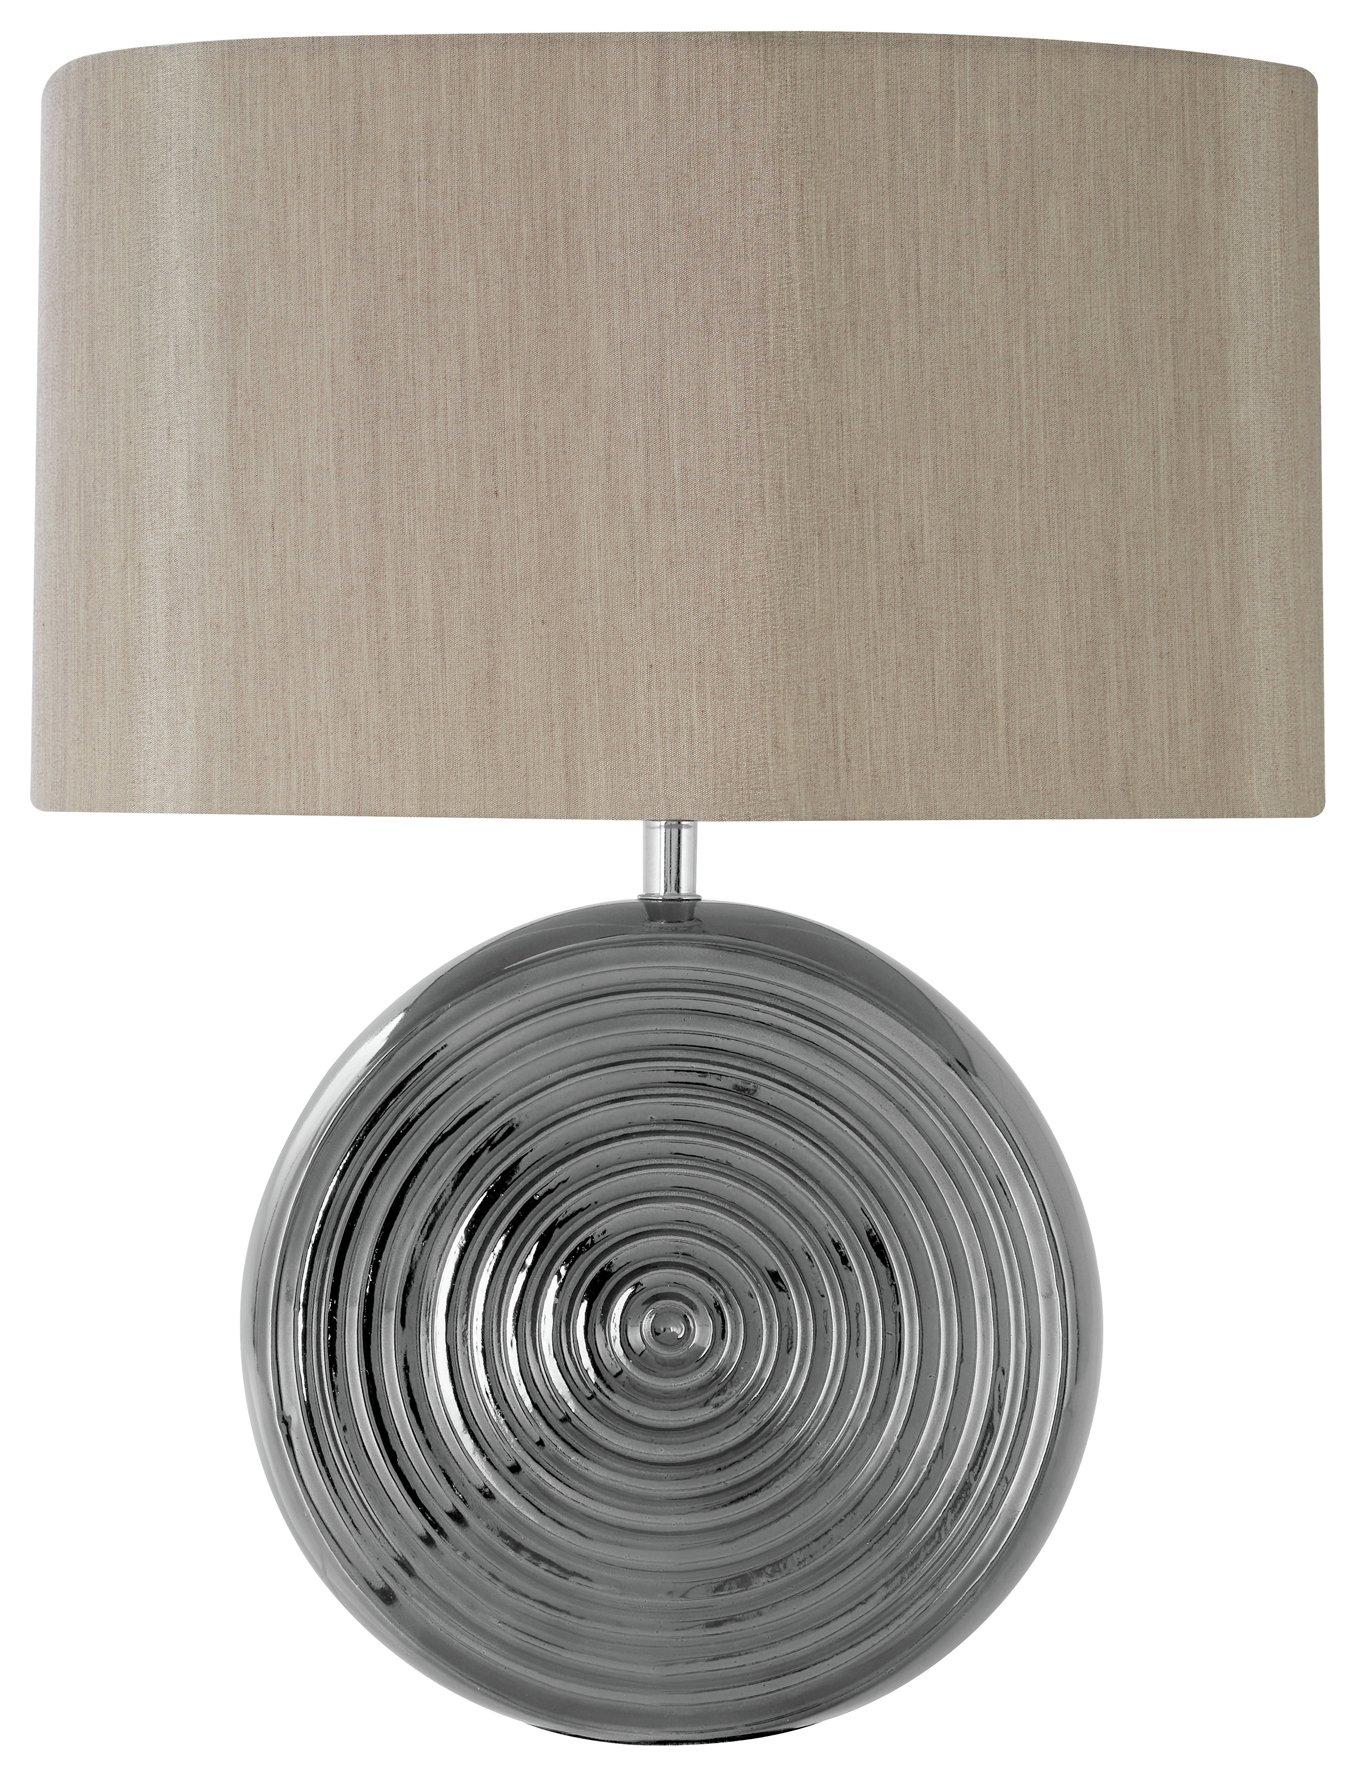 Image of Jessica Ceramic Table Lamp - Natural